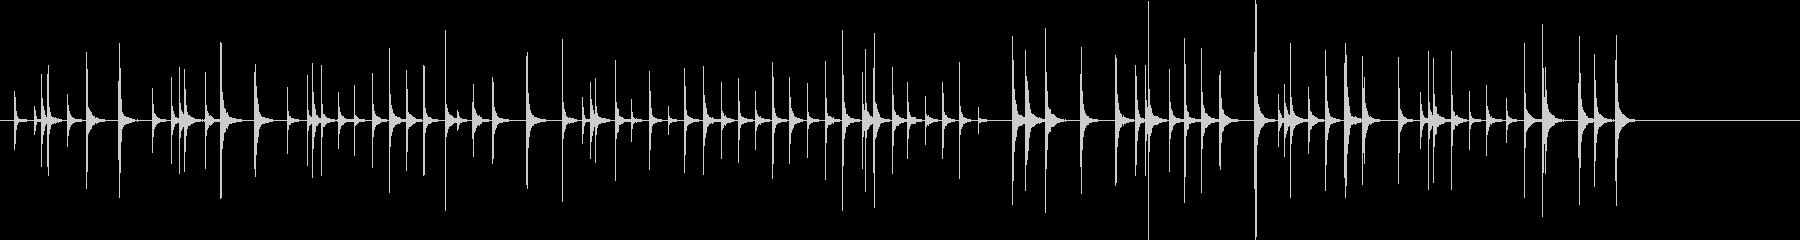 木琴4歌舞伎黒御簾下座音楽和風日本マリンの未再生の波形